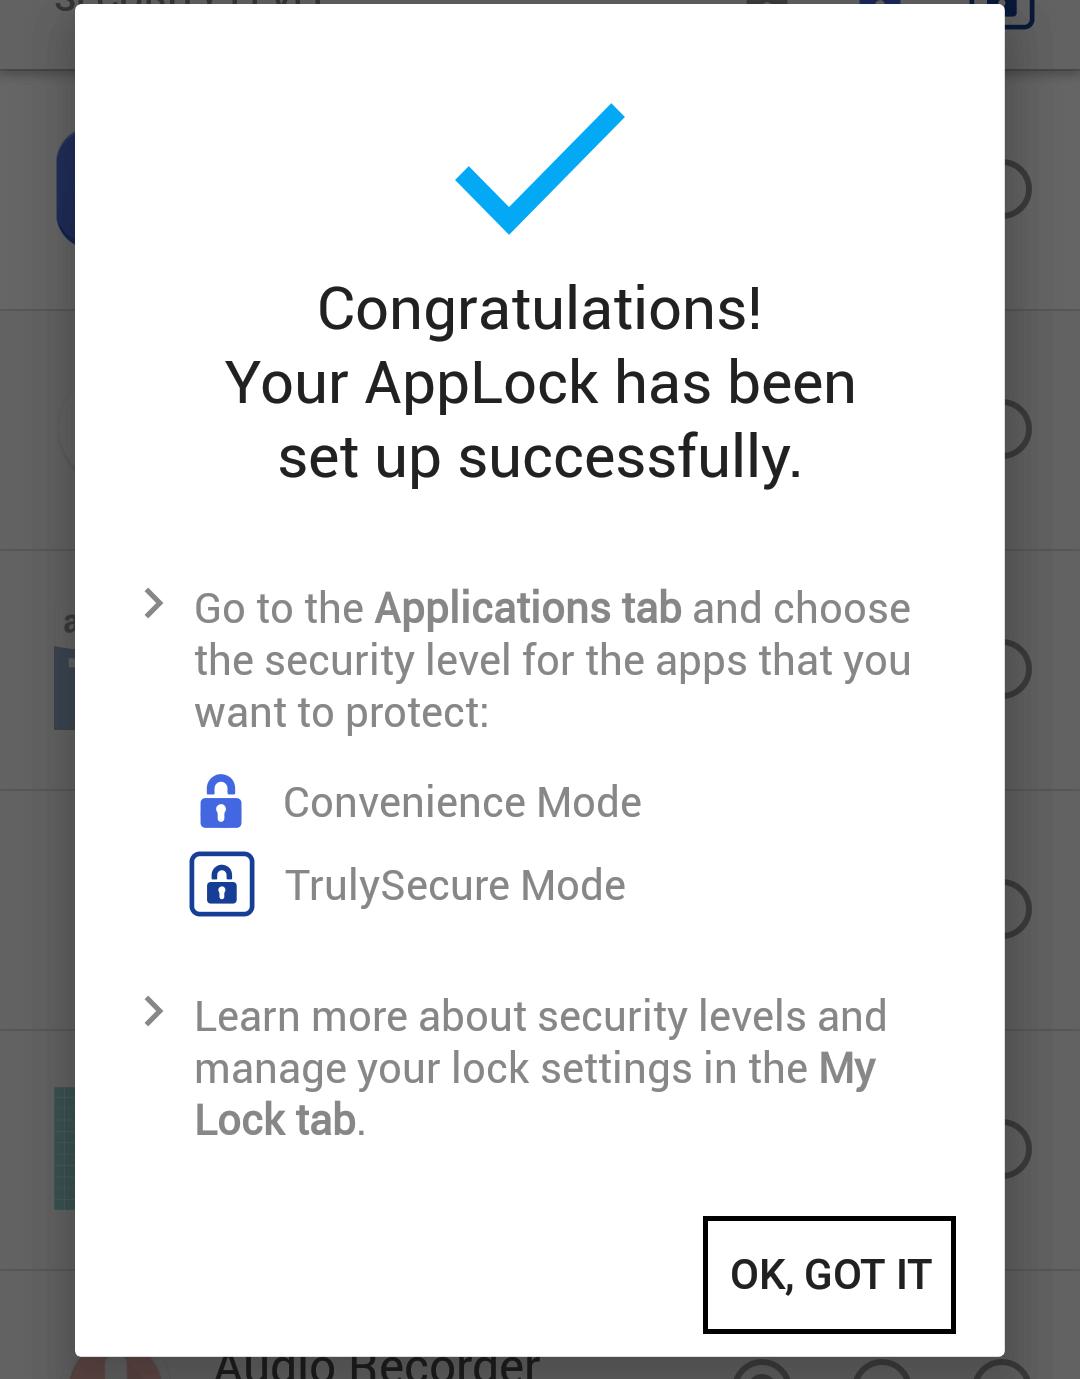 Applock access successfully